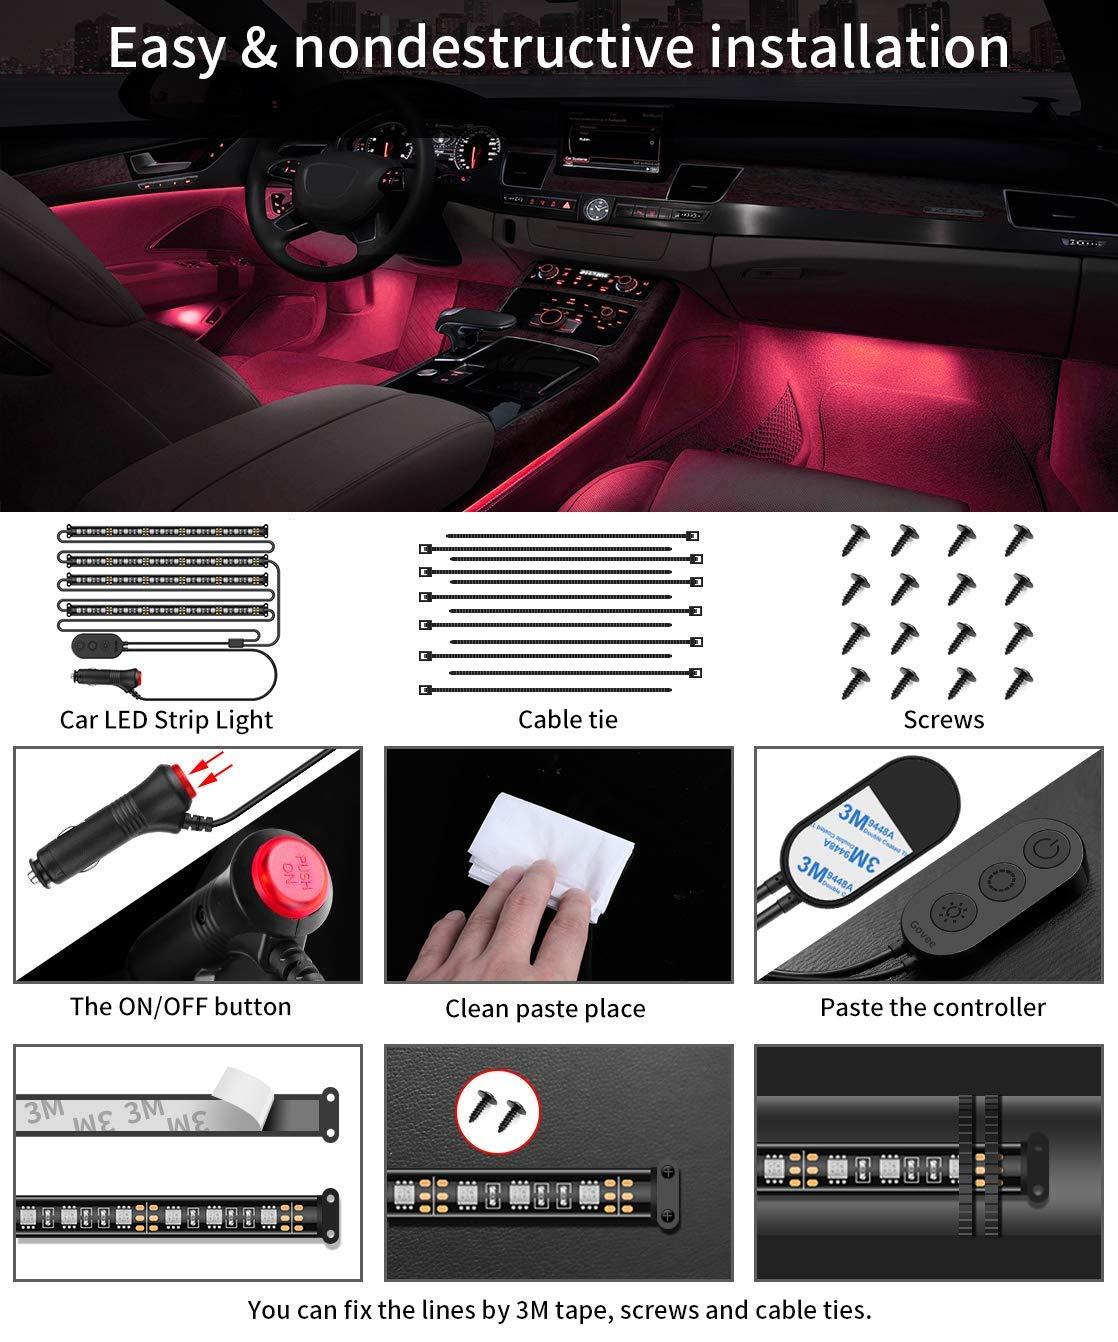 Auto LED Innenbeleuchtung Govee RGB LED Beleuchtung Auto Musik LED Strip 12V Autoladeger/ät Enthalten Wasserdicht 44 LEDs Lichtband Kit T/öne aktive Funktion durch Mikrofon und Praktischem Controller